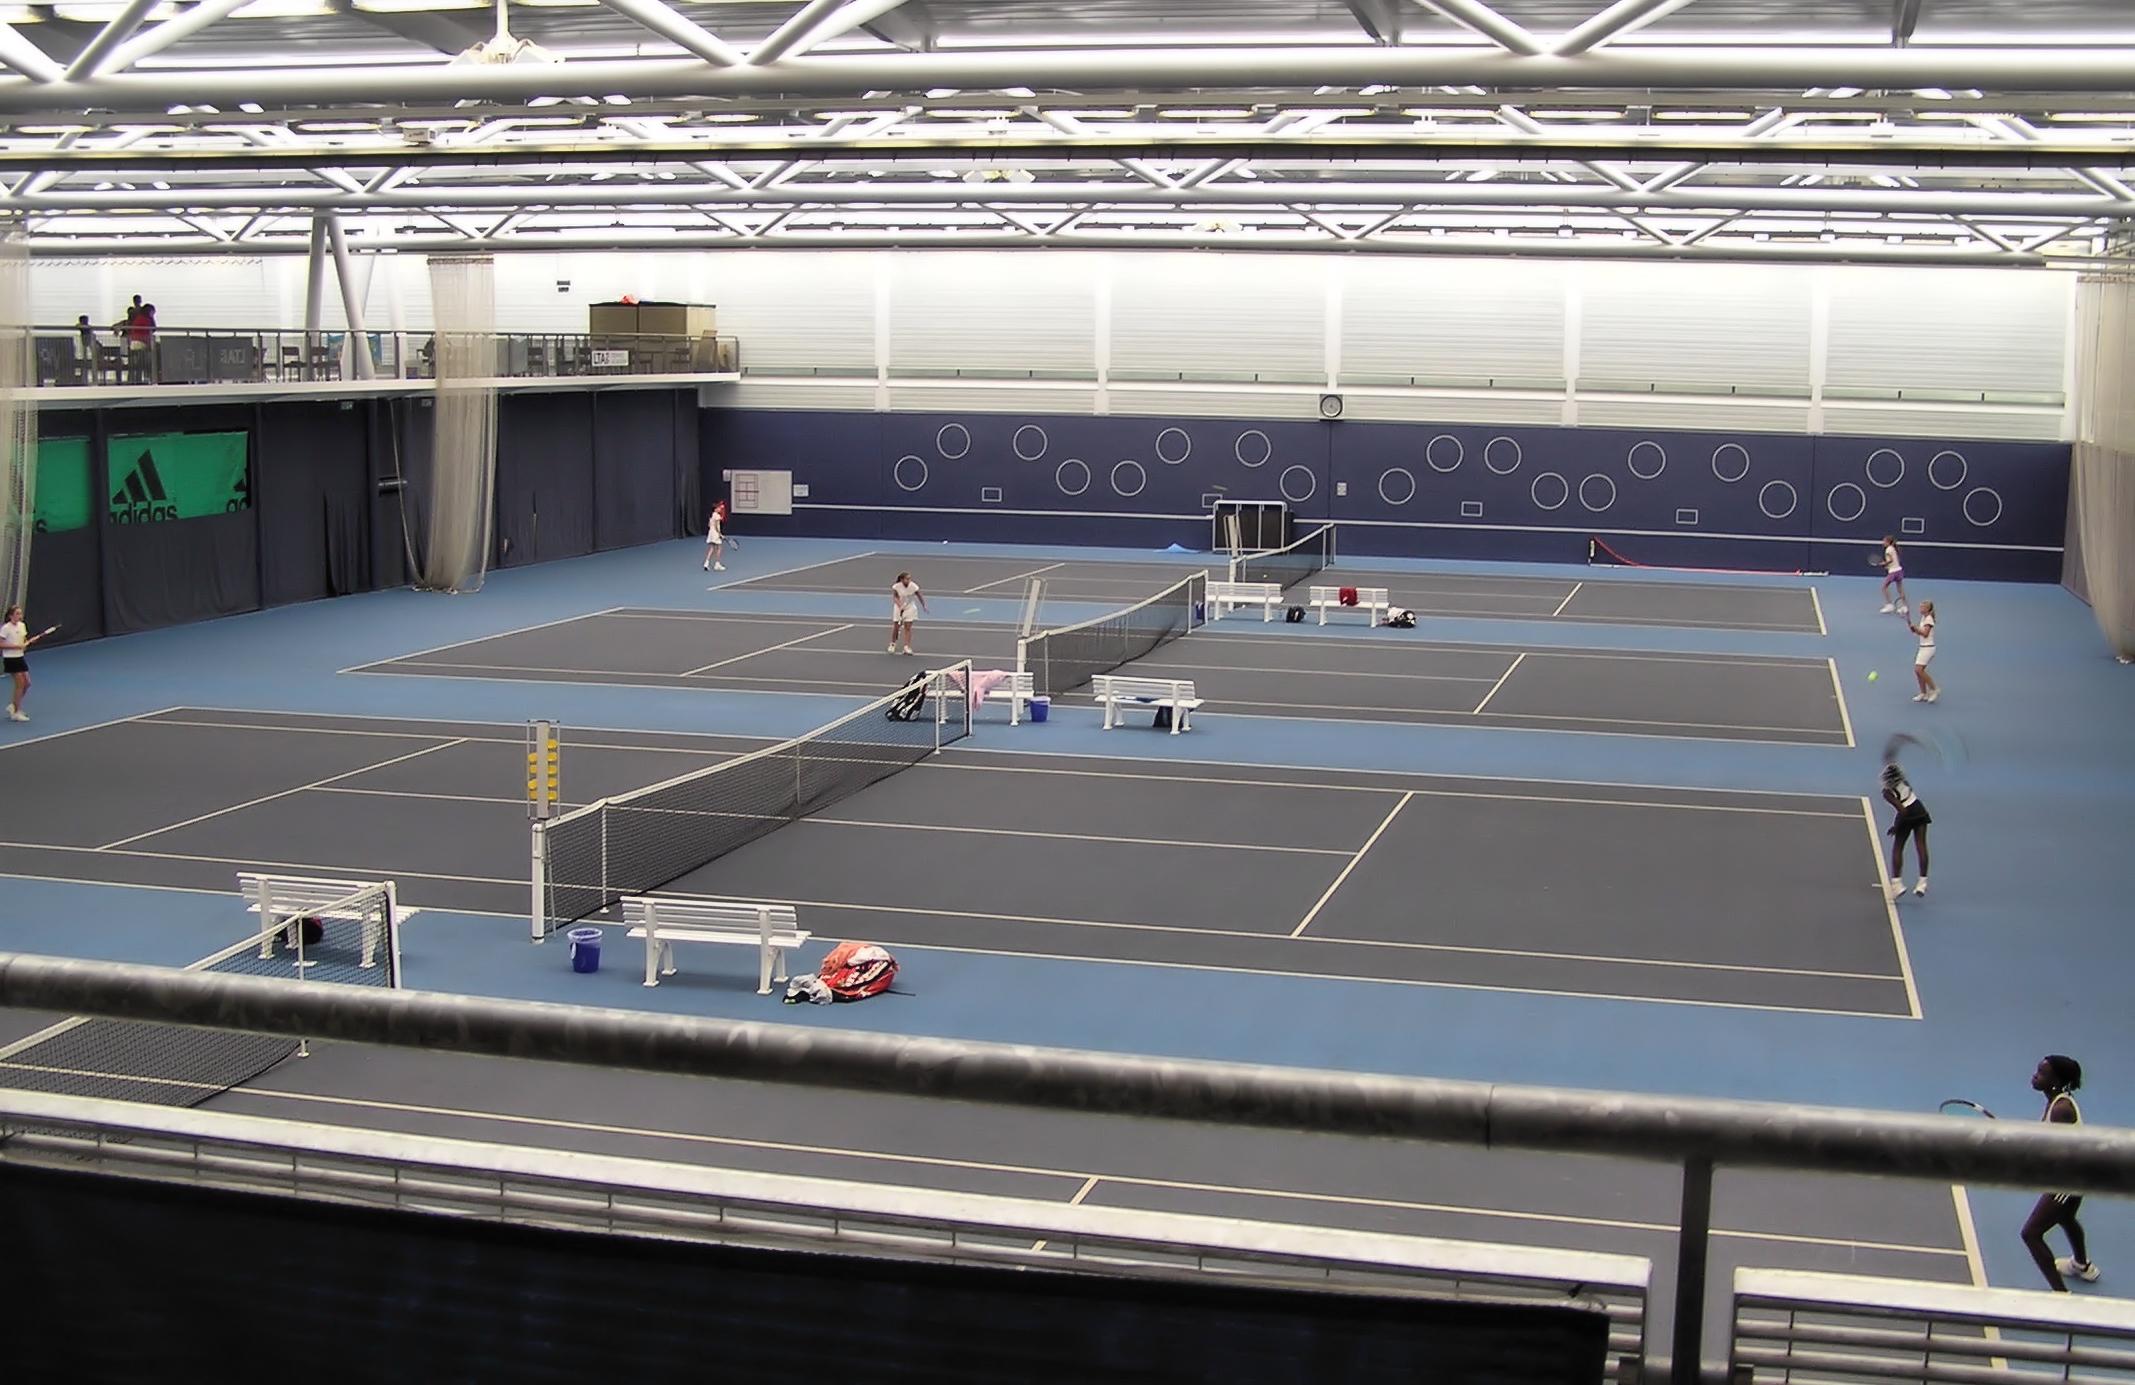 Tennis Court Wikipedia